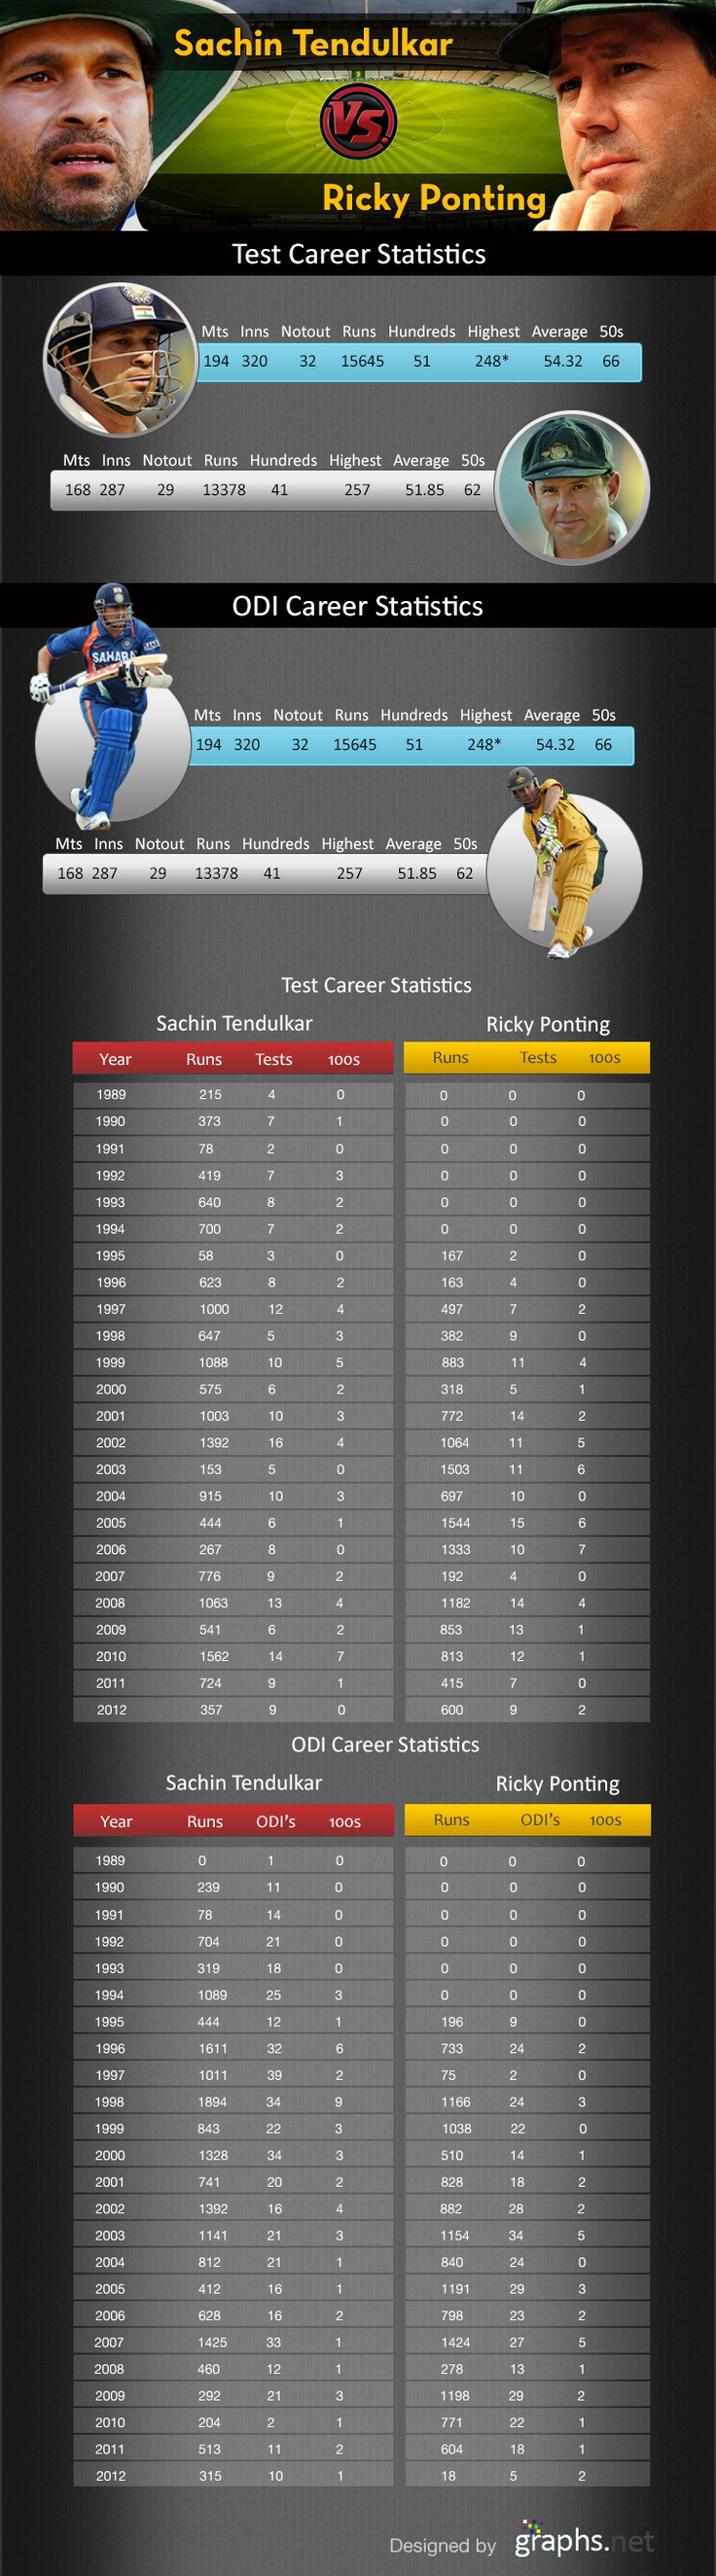 Sachin Tendulkar vs Ricky Ponting Statistics #Sachin #Tendulkar #vs #Ricky #Ponting #Statistics #Sports #Cricket #Infographics